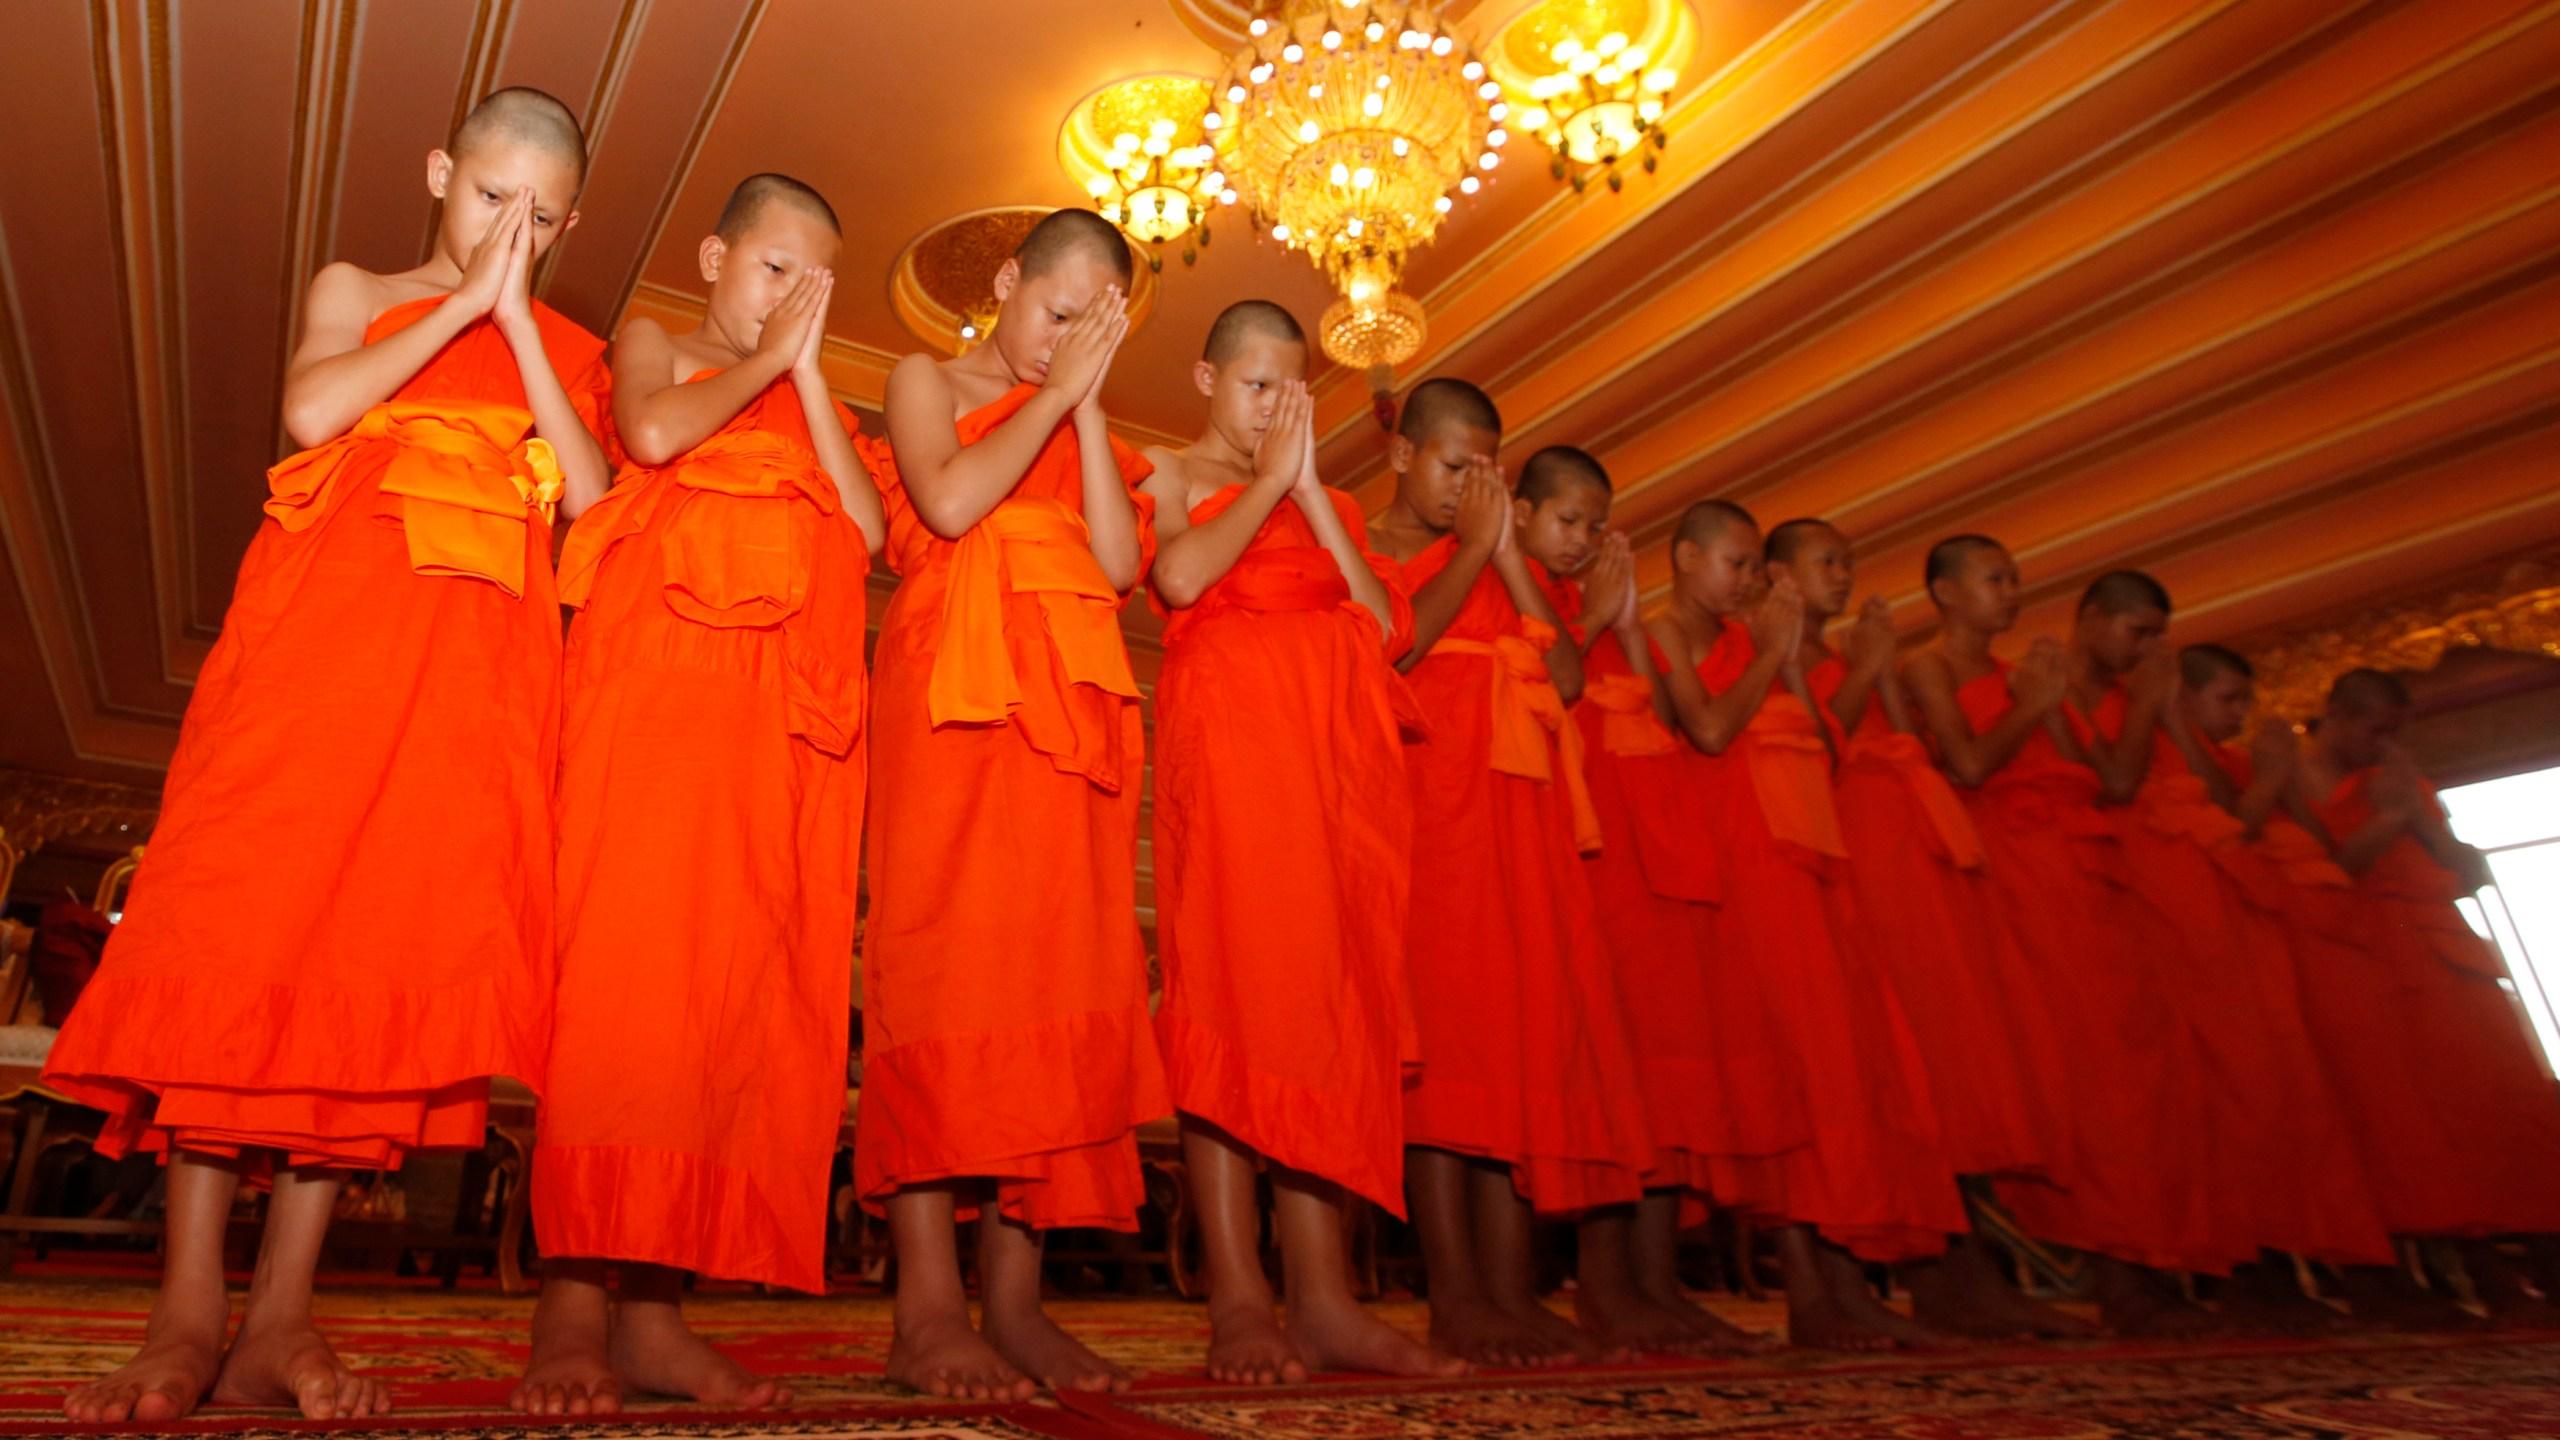 Thailand_Cave_14618-159532.jpg00774034